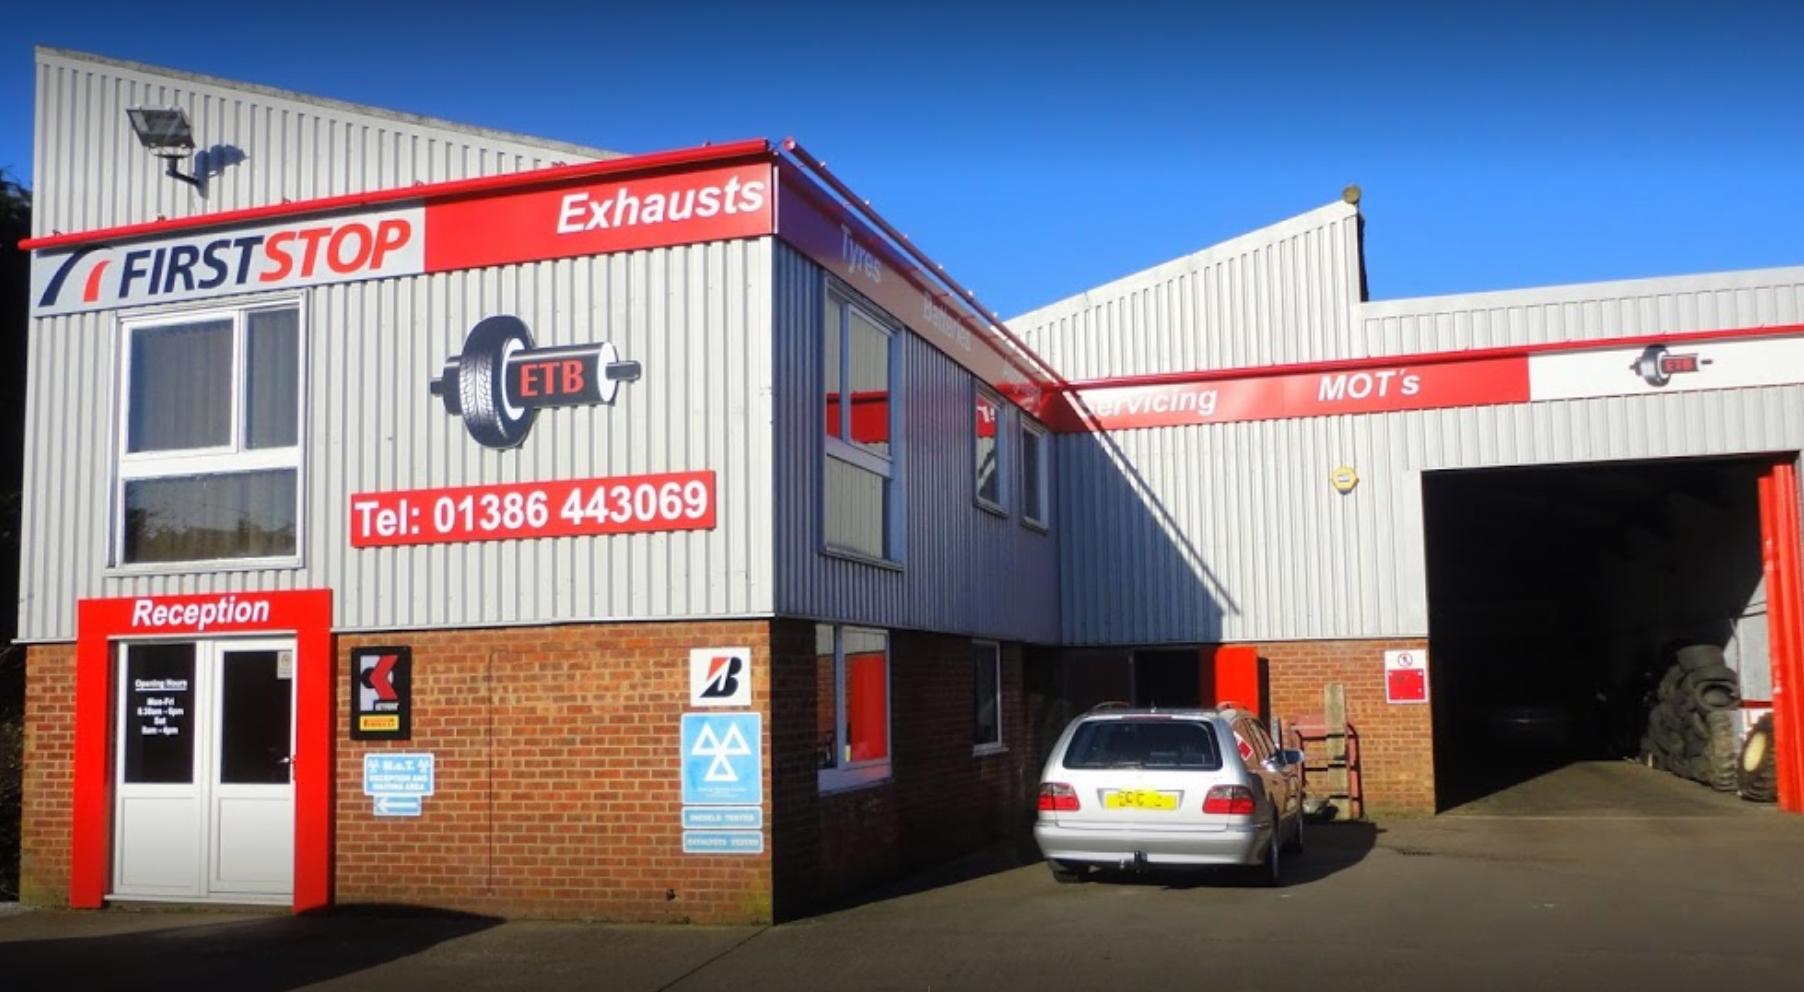 ETB - Exhaust Tyres & Batteries Evesham